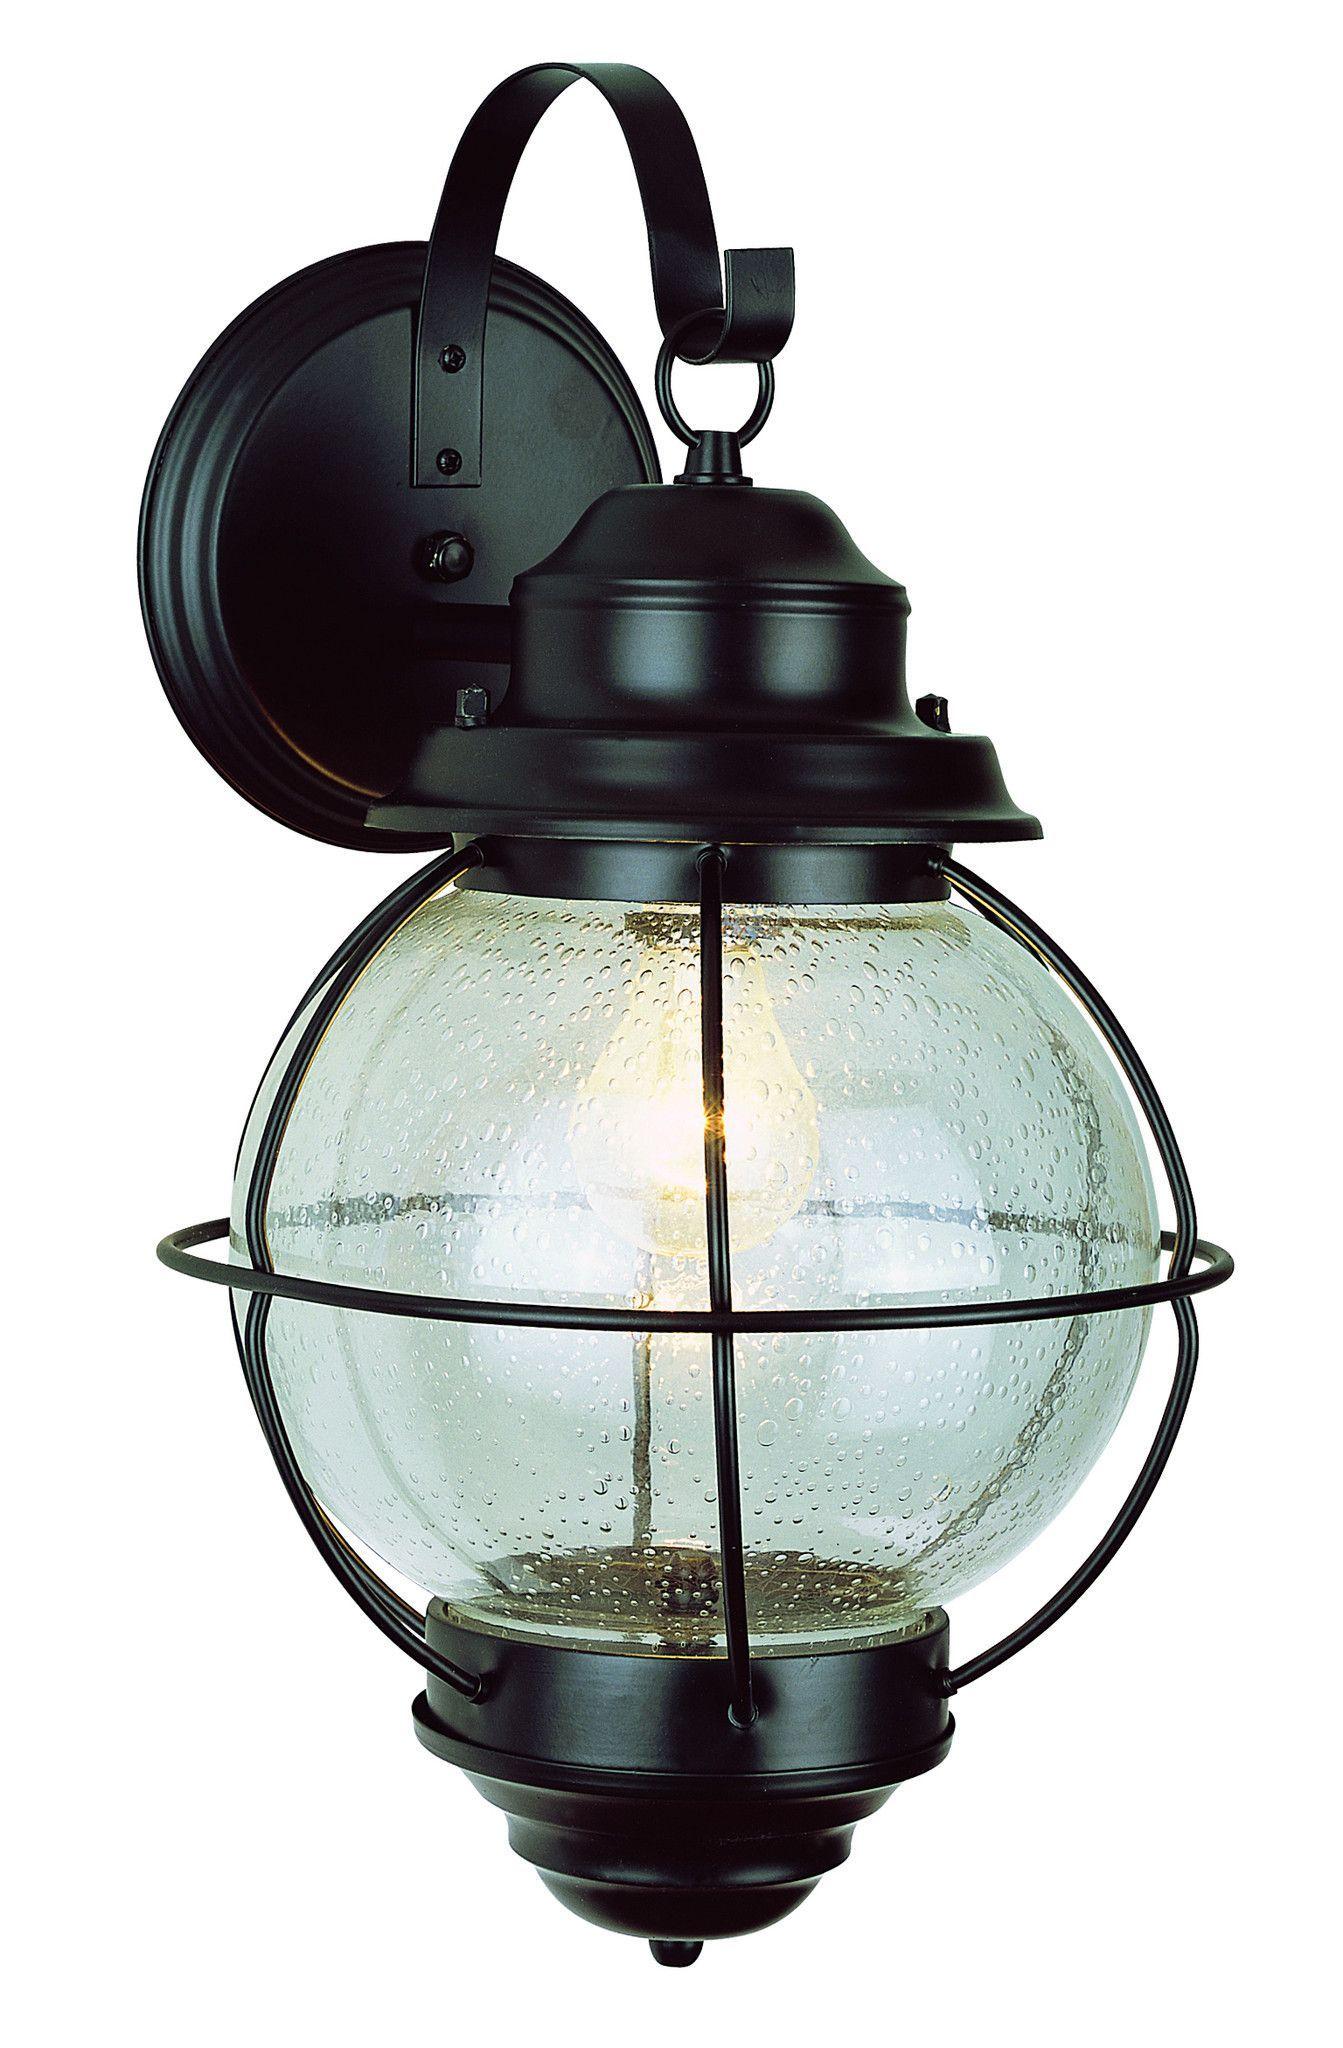 trans globe lighting 69901 bk onion lantern wall light 15 black